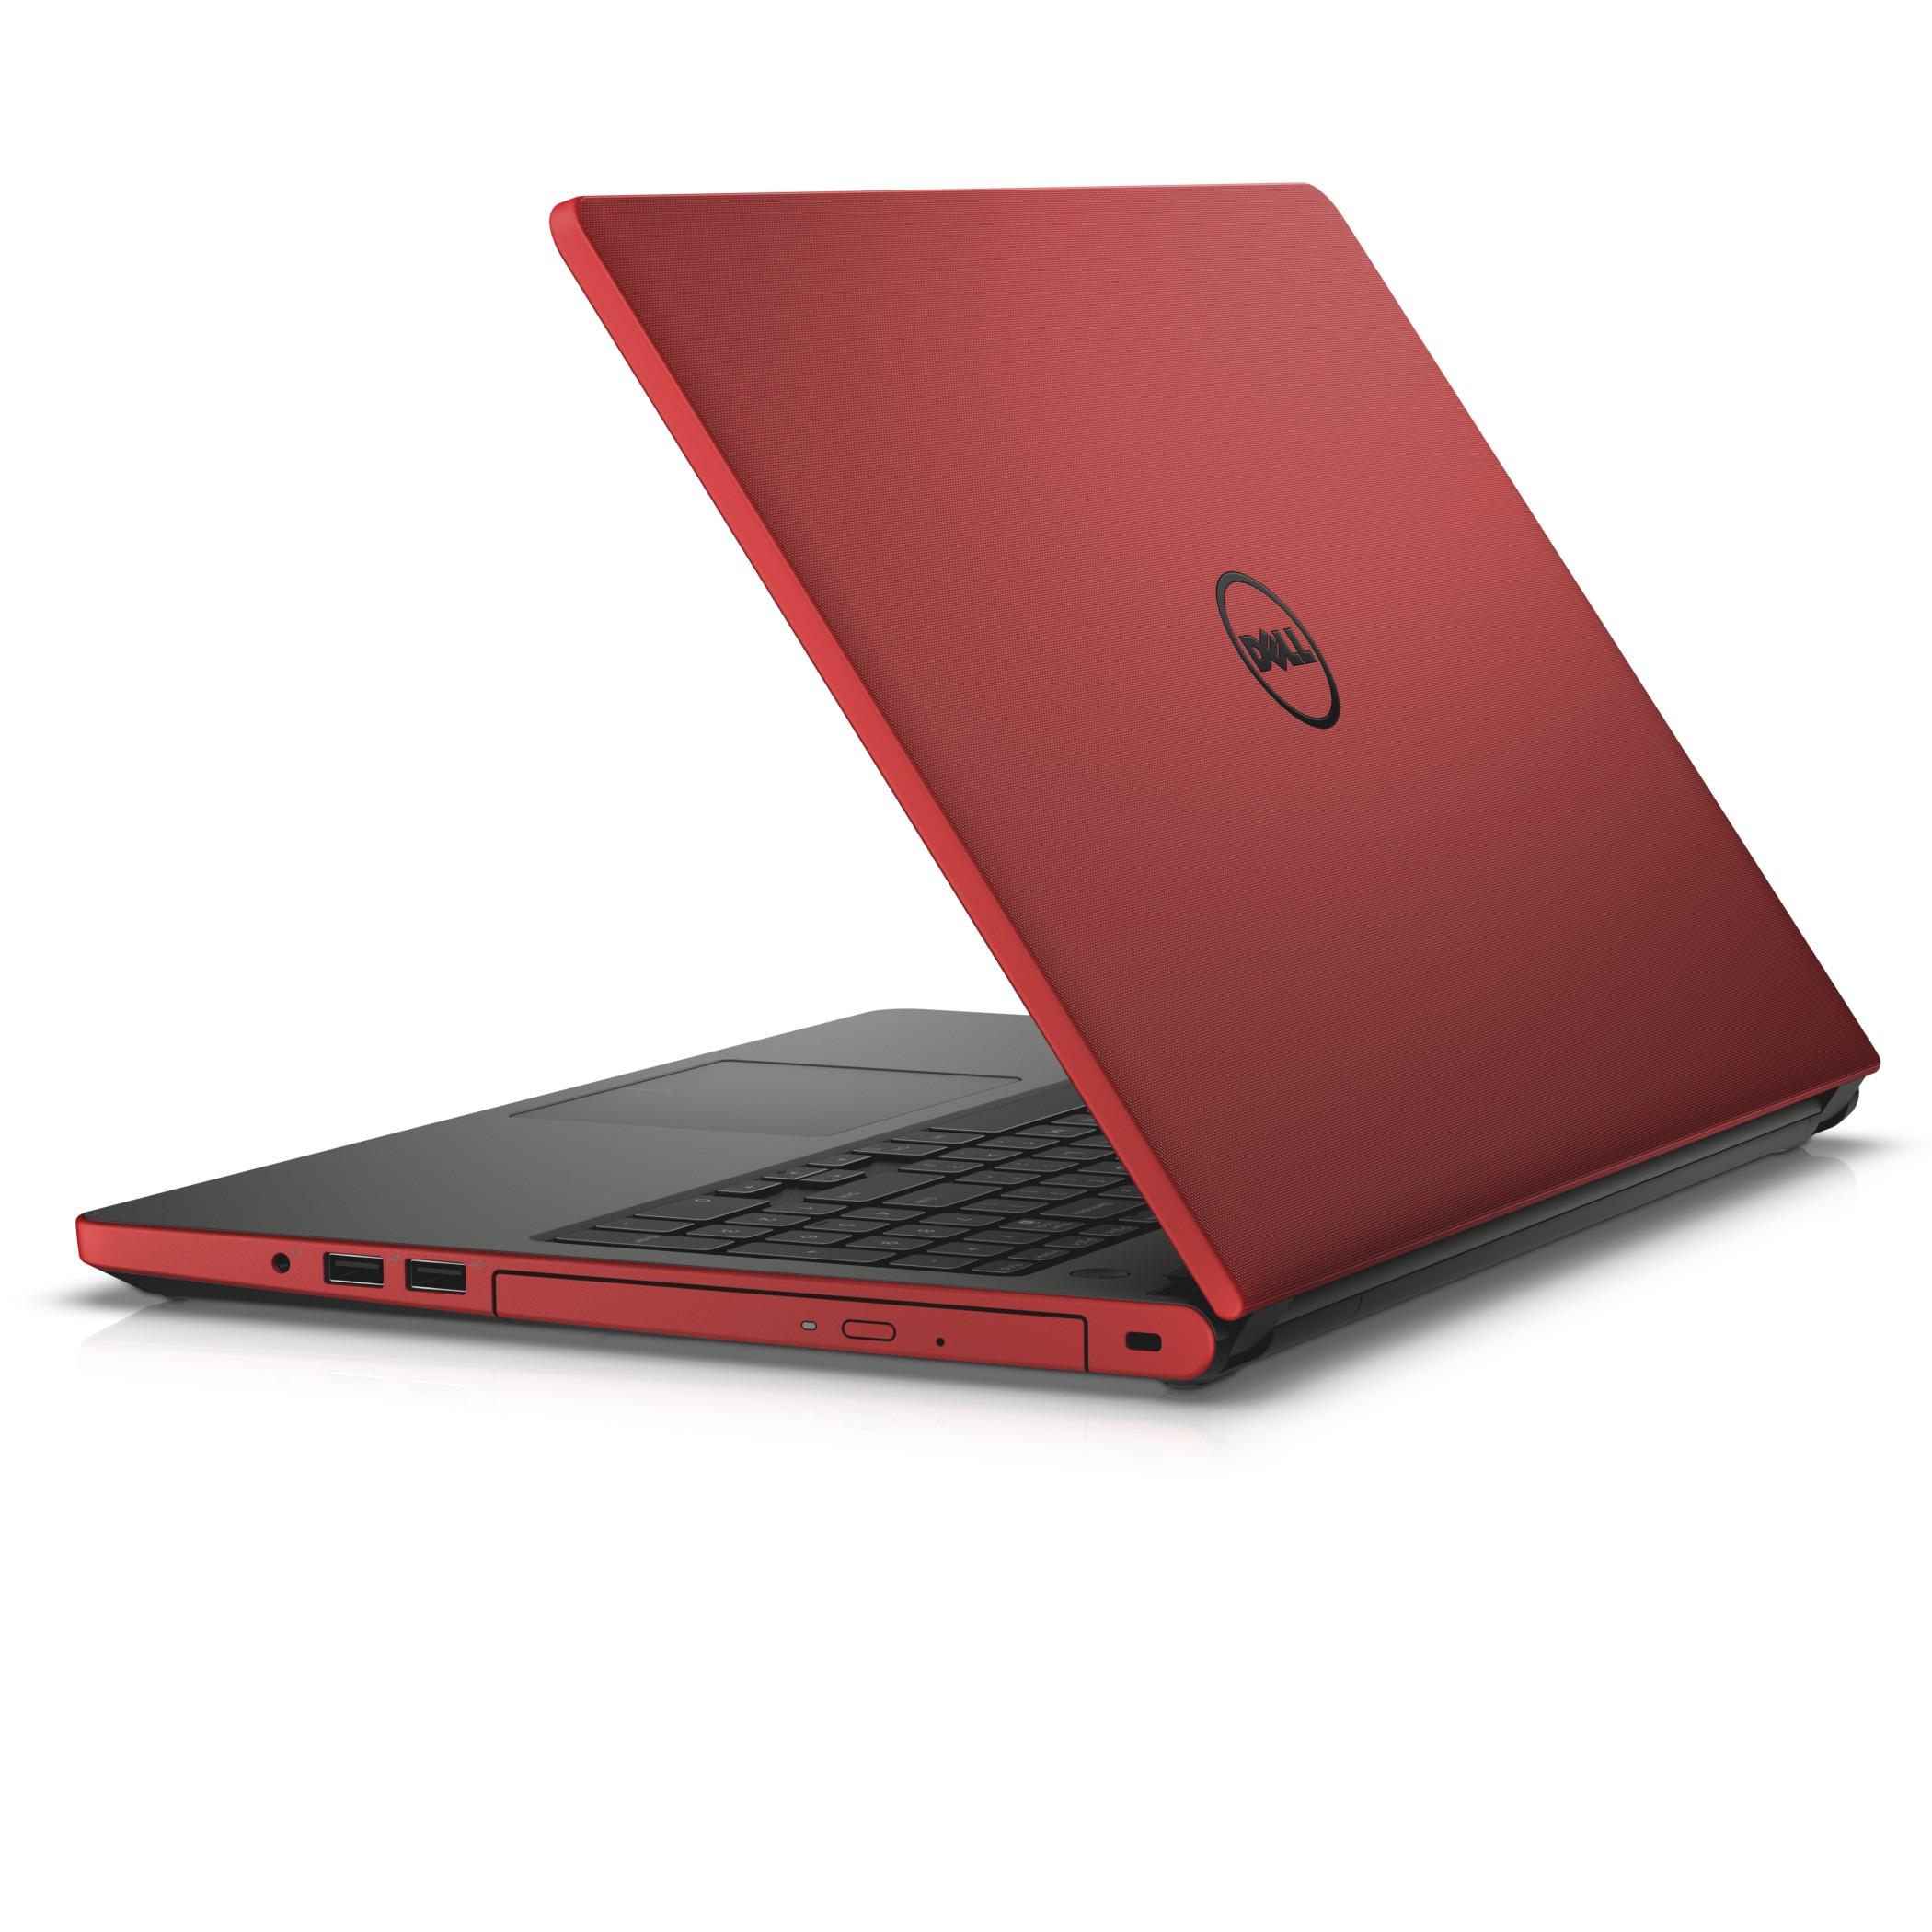 "Dell Inspiron 5558 15"" i3-5005U/4GB/500GB/920M-2G/HDMI/RJ45/WIFI/BT/MCR/W8.1/2NBD červený"